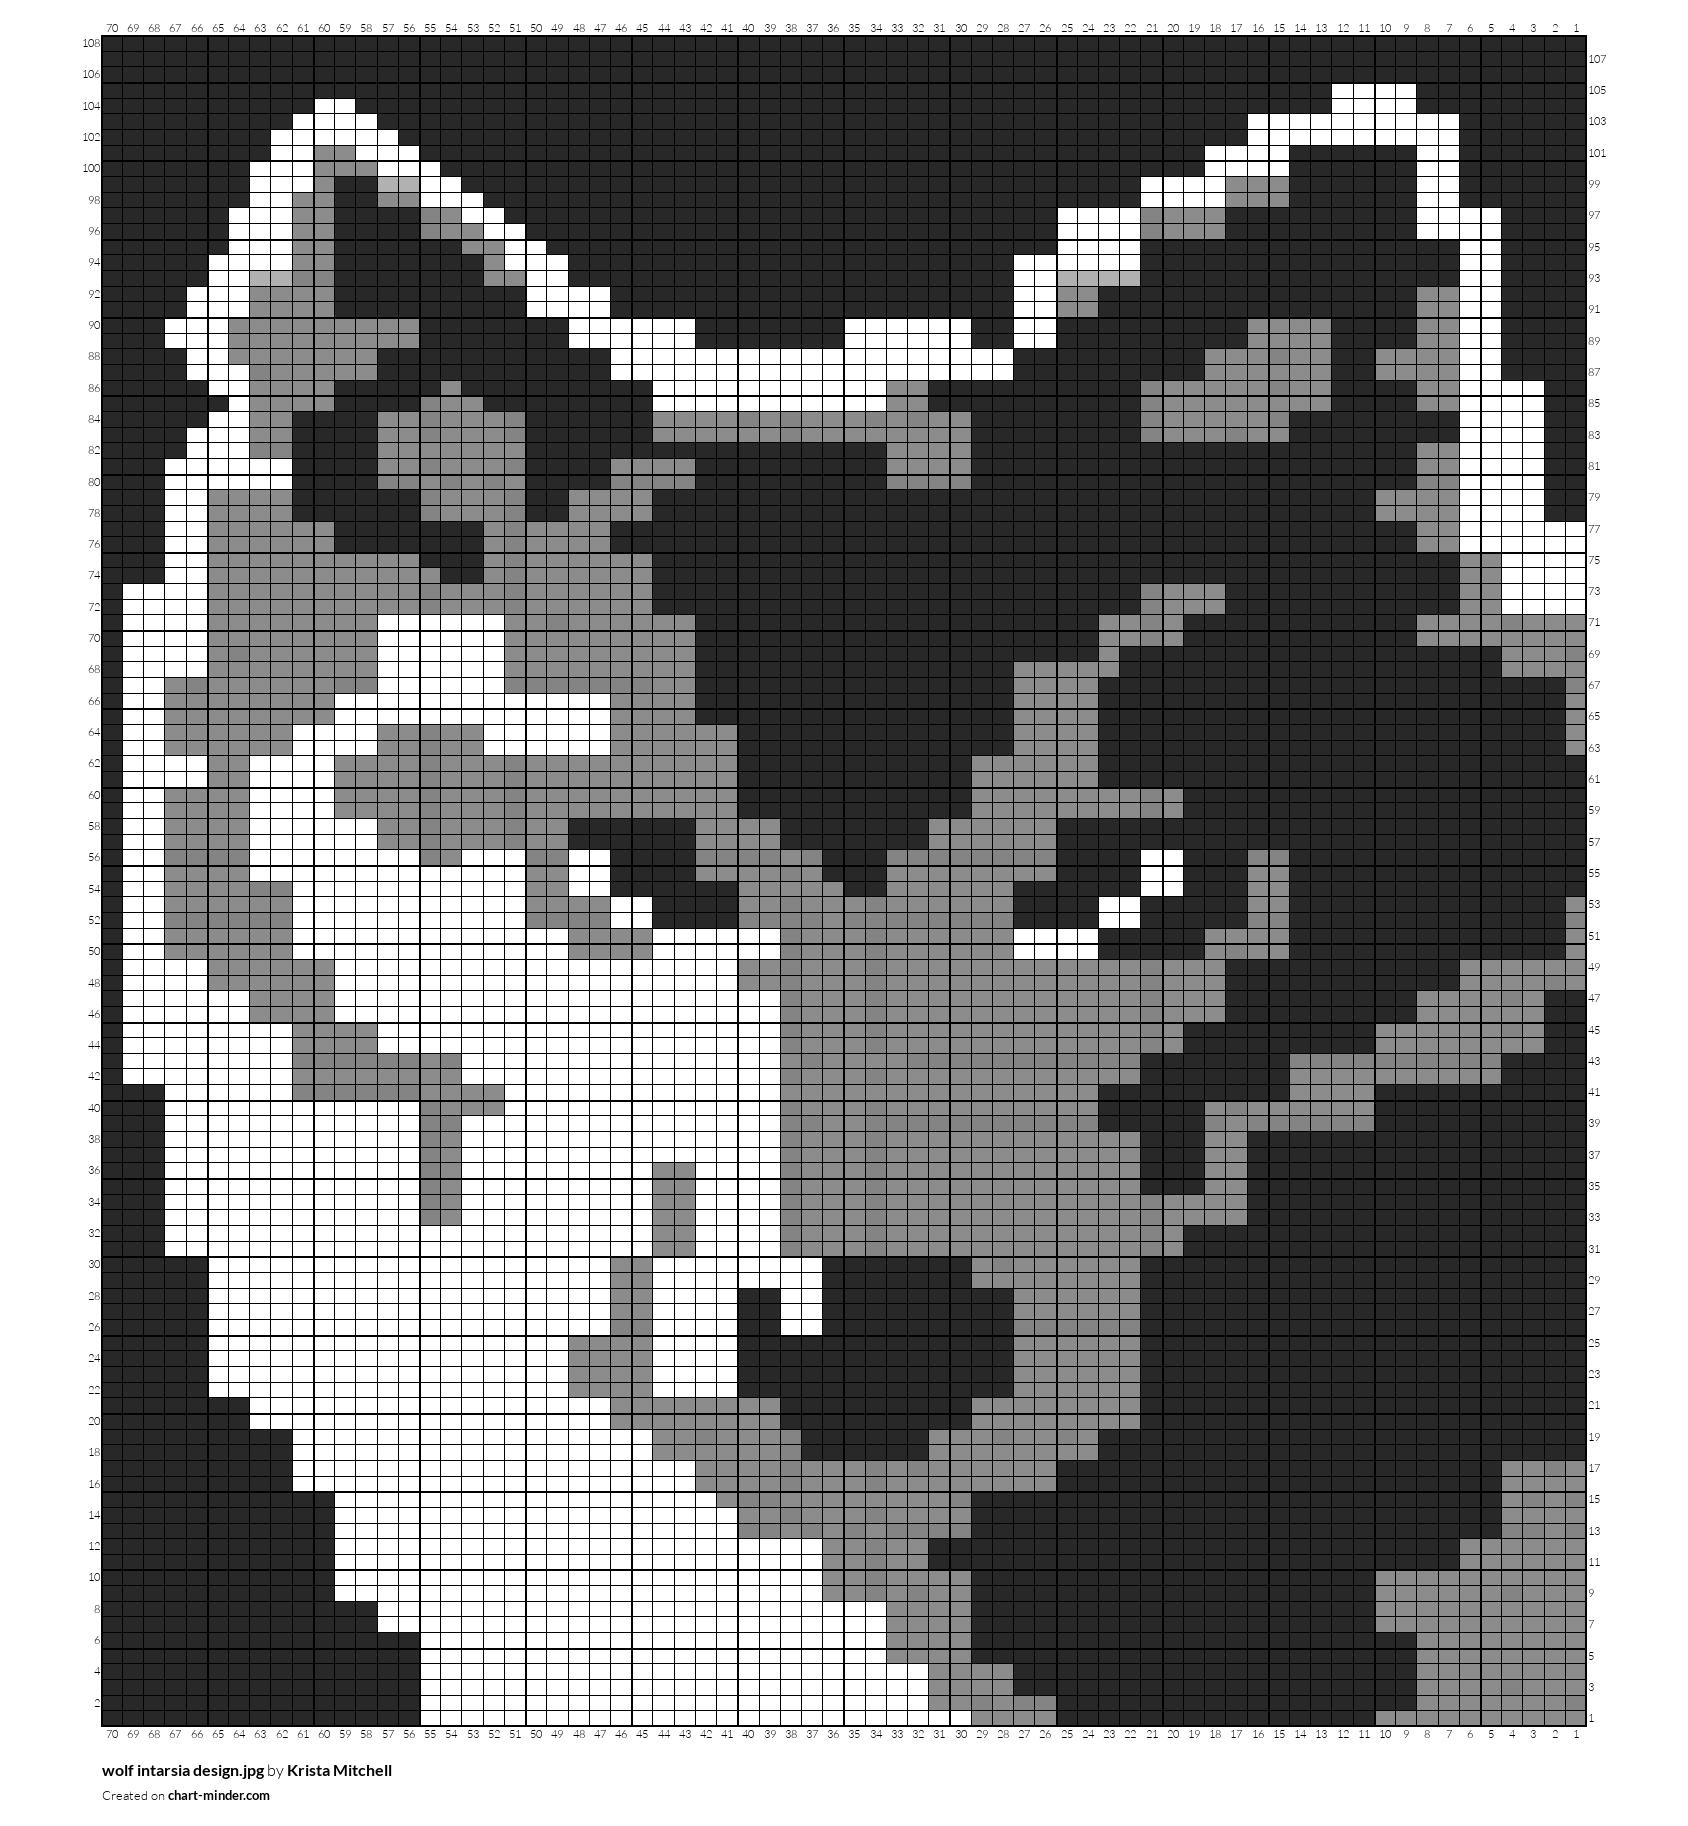 Copy of wolf intarsia design.jpg